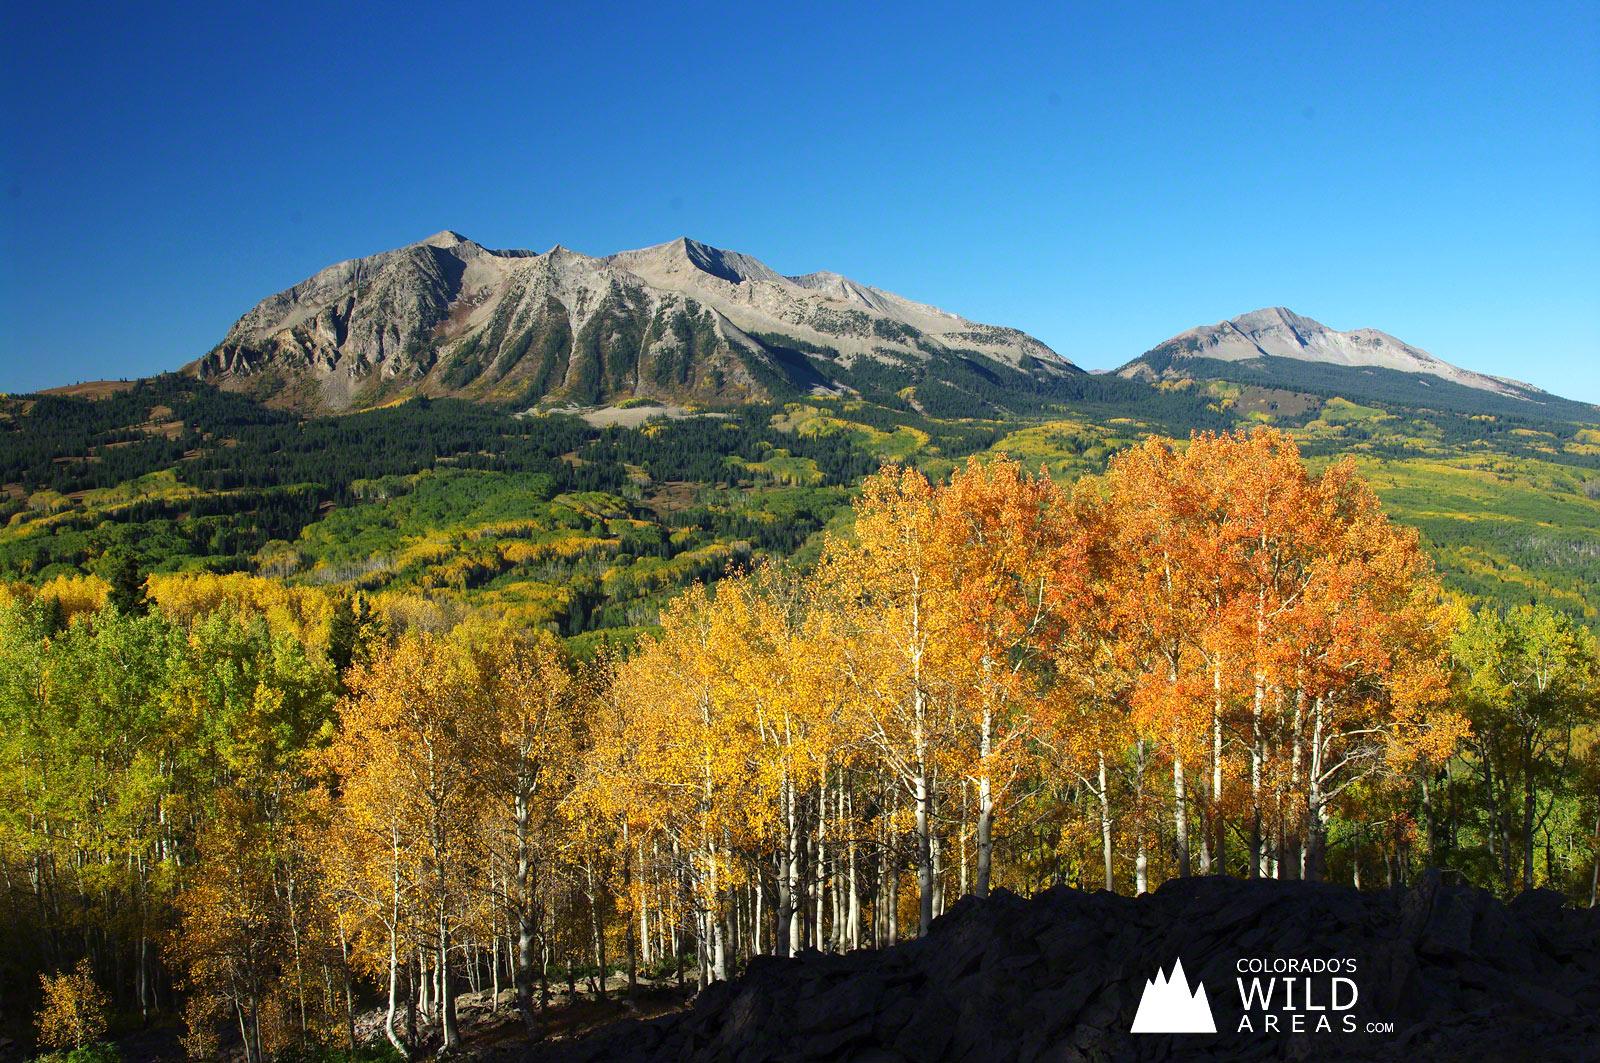 Colorados Fall Colors Wallpaper Colorados Wild Areas 1600x1063